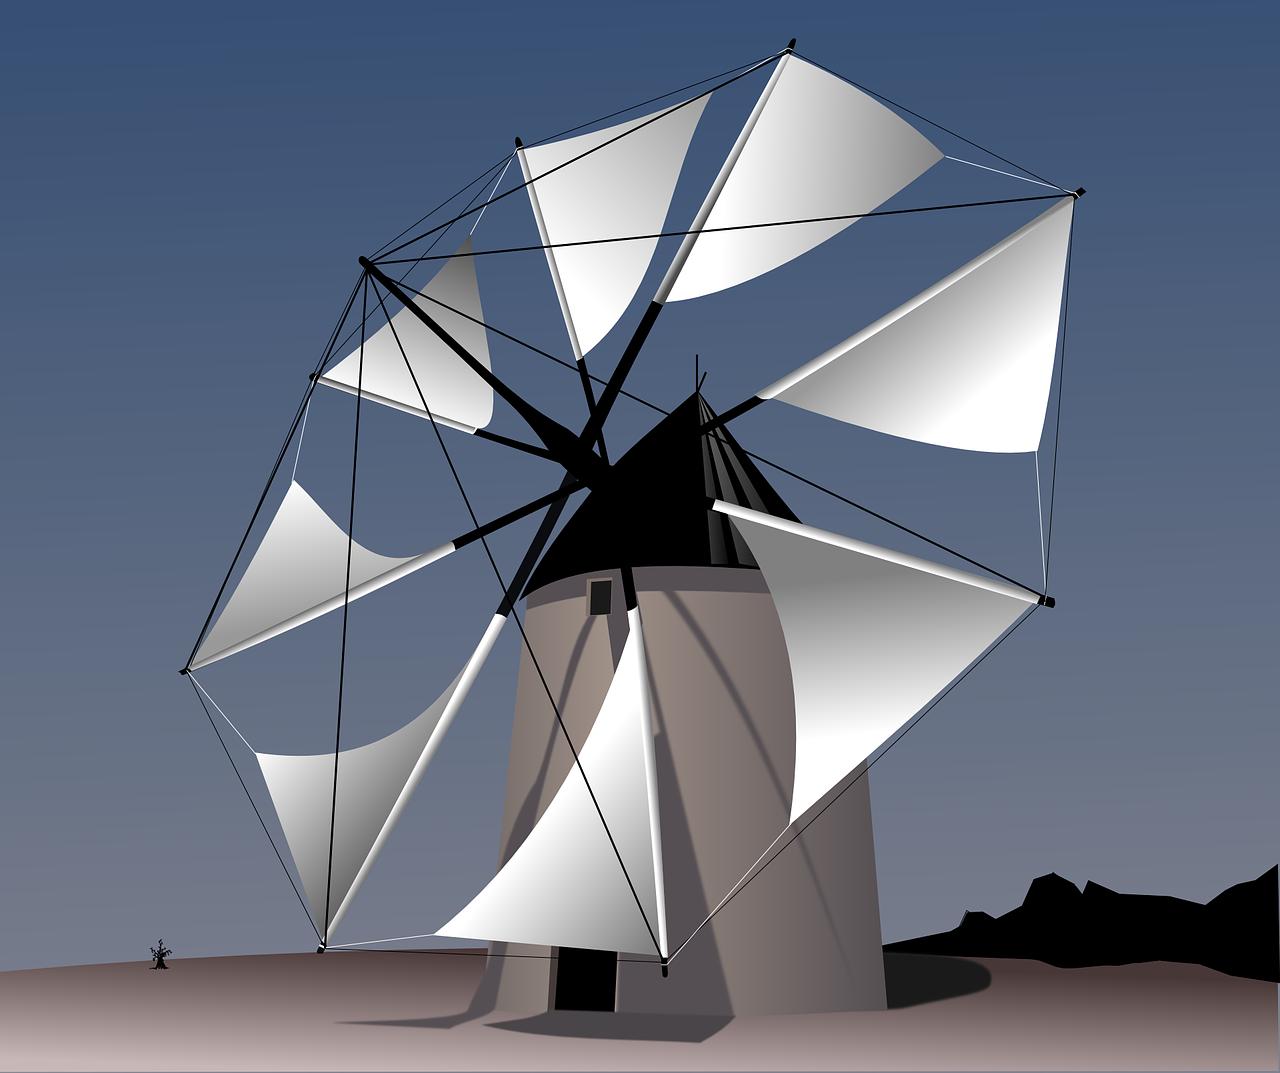 windmill-157858_1280.png